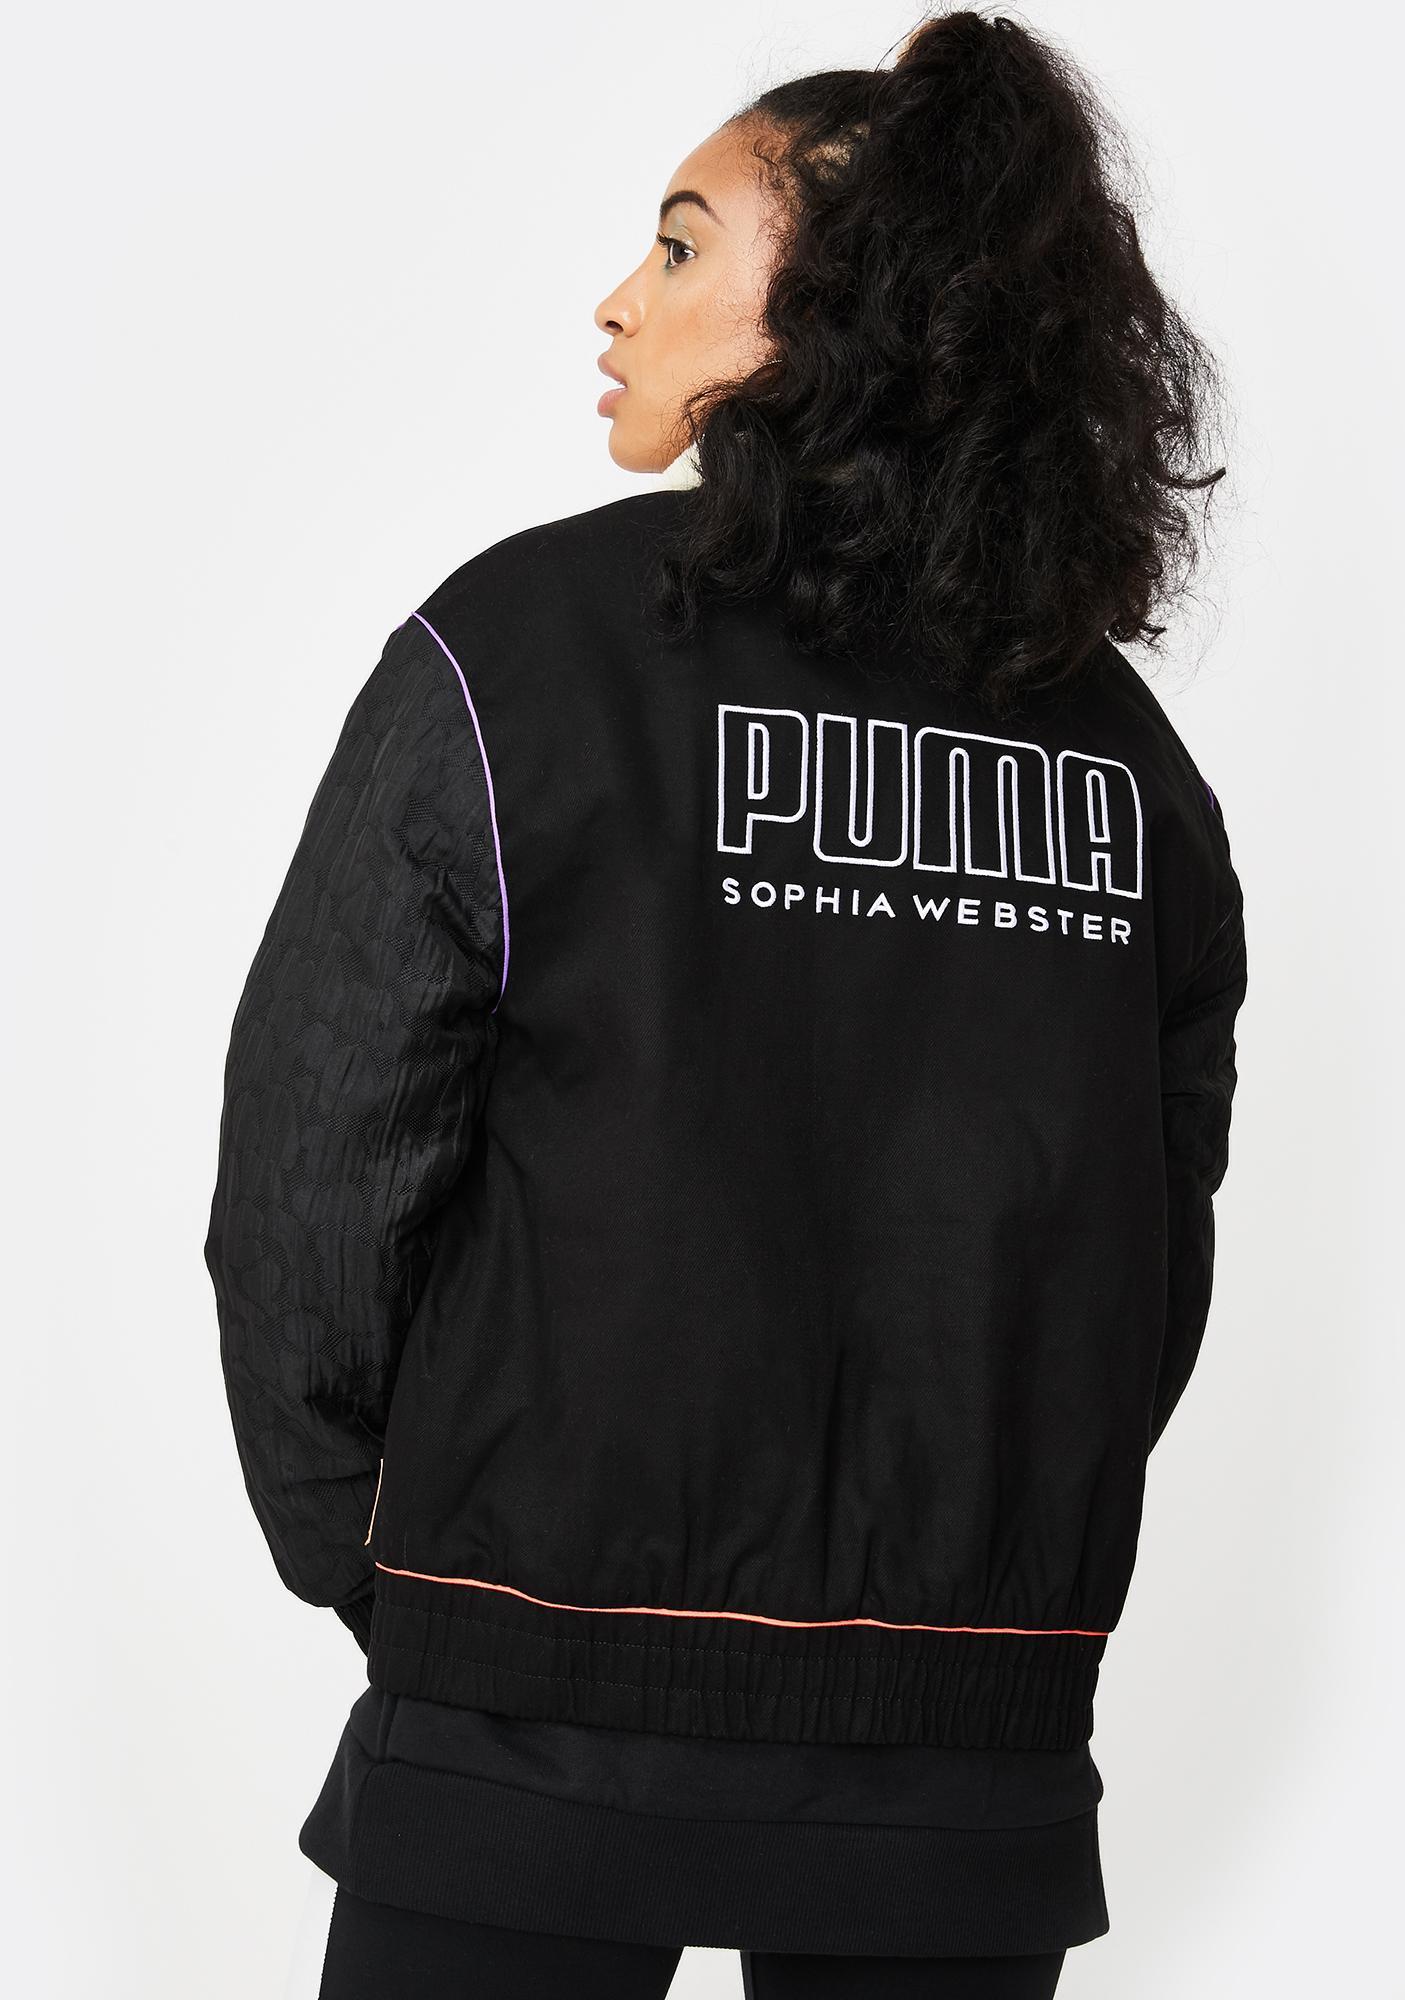 PUMA X Sophia Webster Bomber Jacket